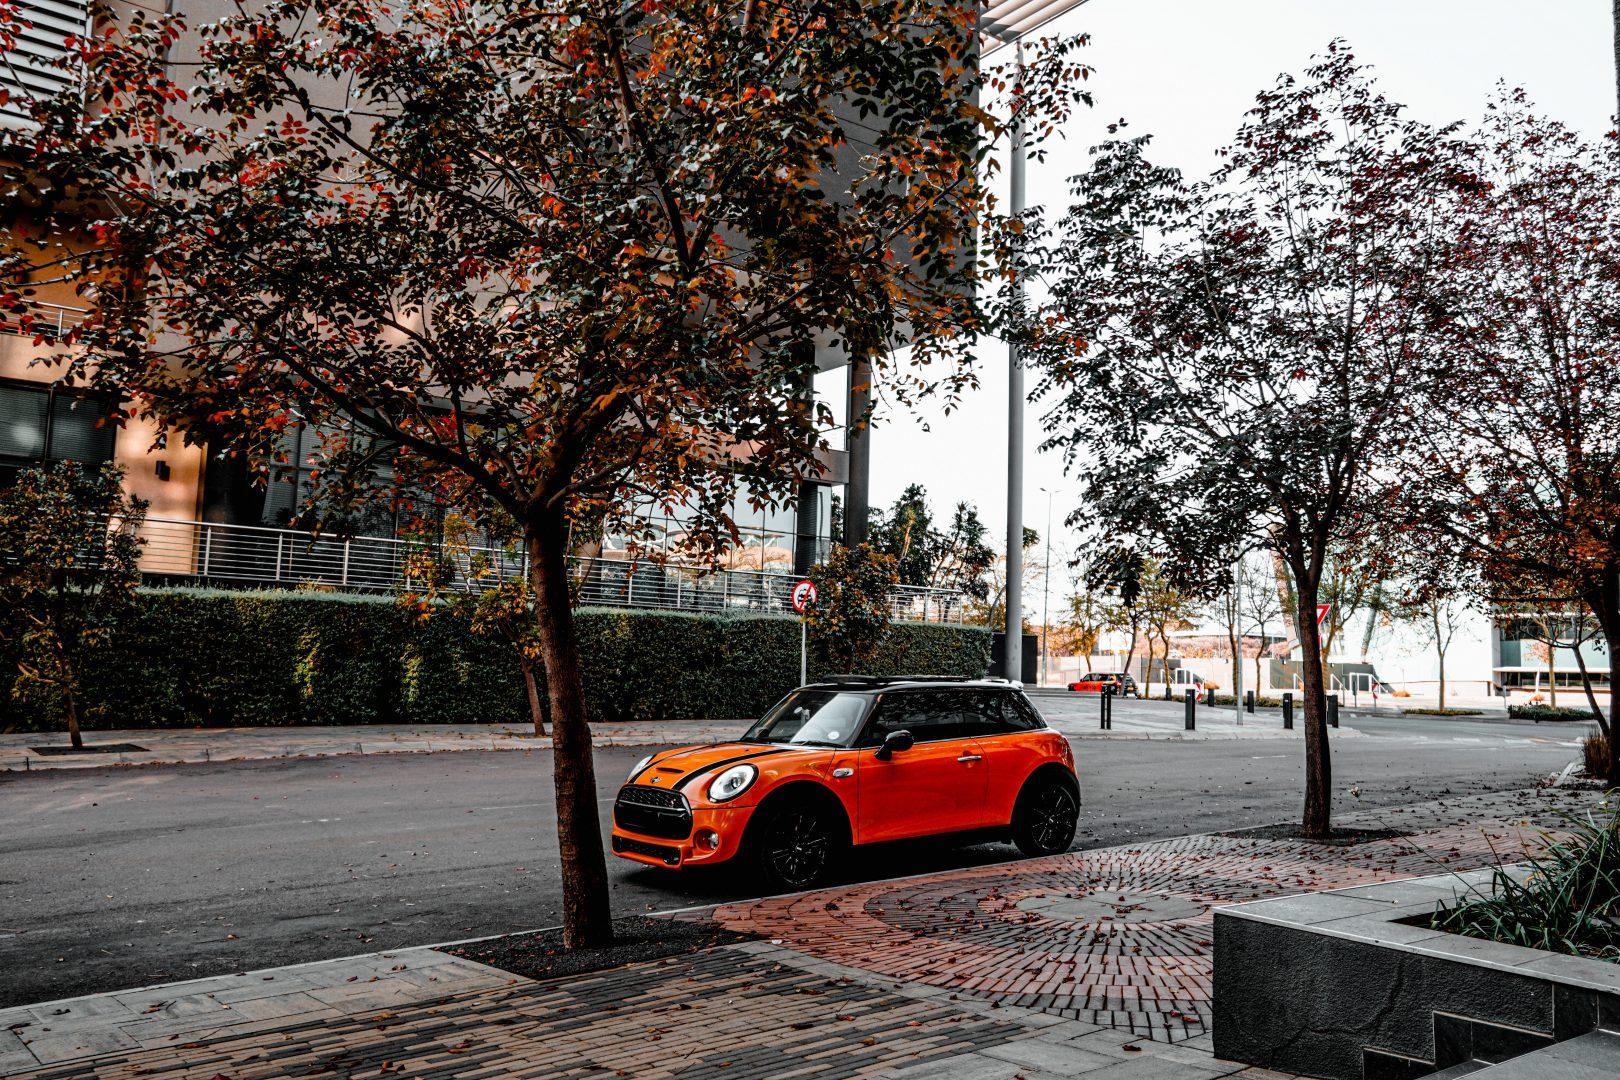 orange car parked near trees during daytime